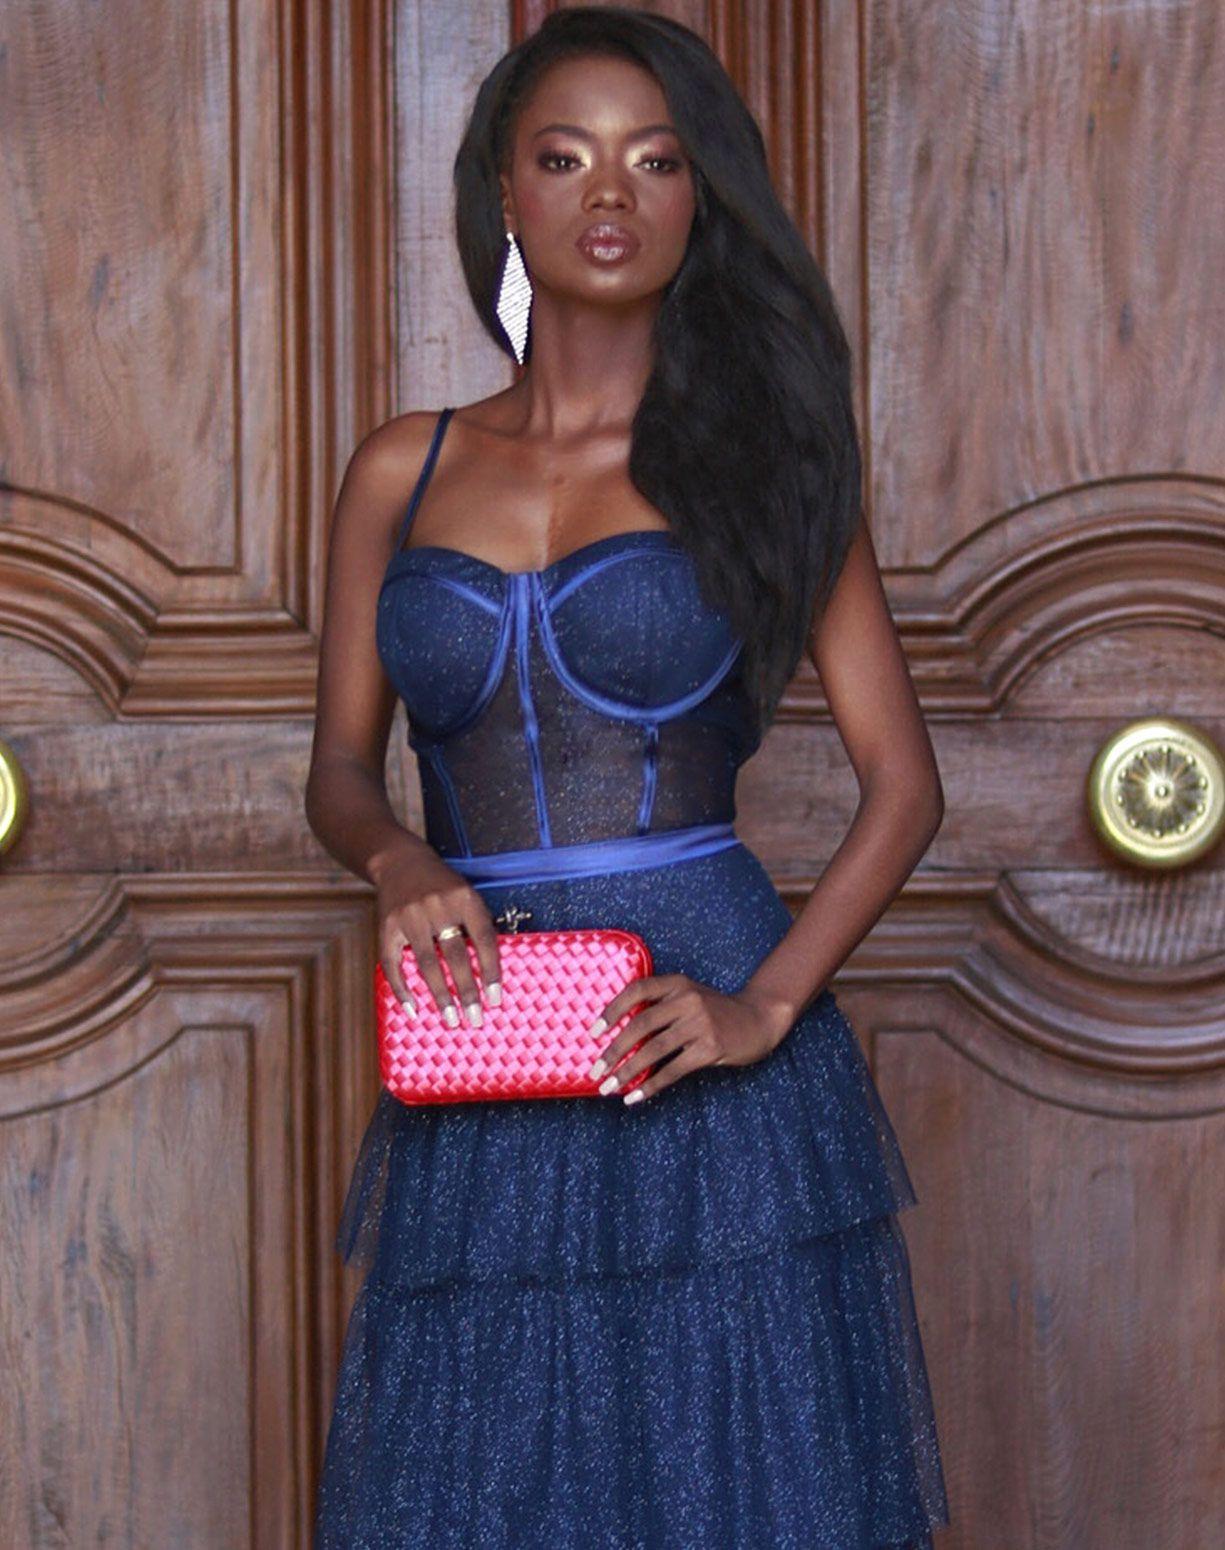 Vestido Azul Marinho Tule Glitter com Corpete